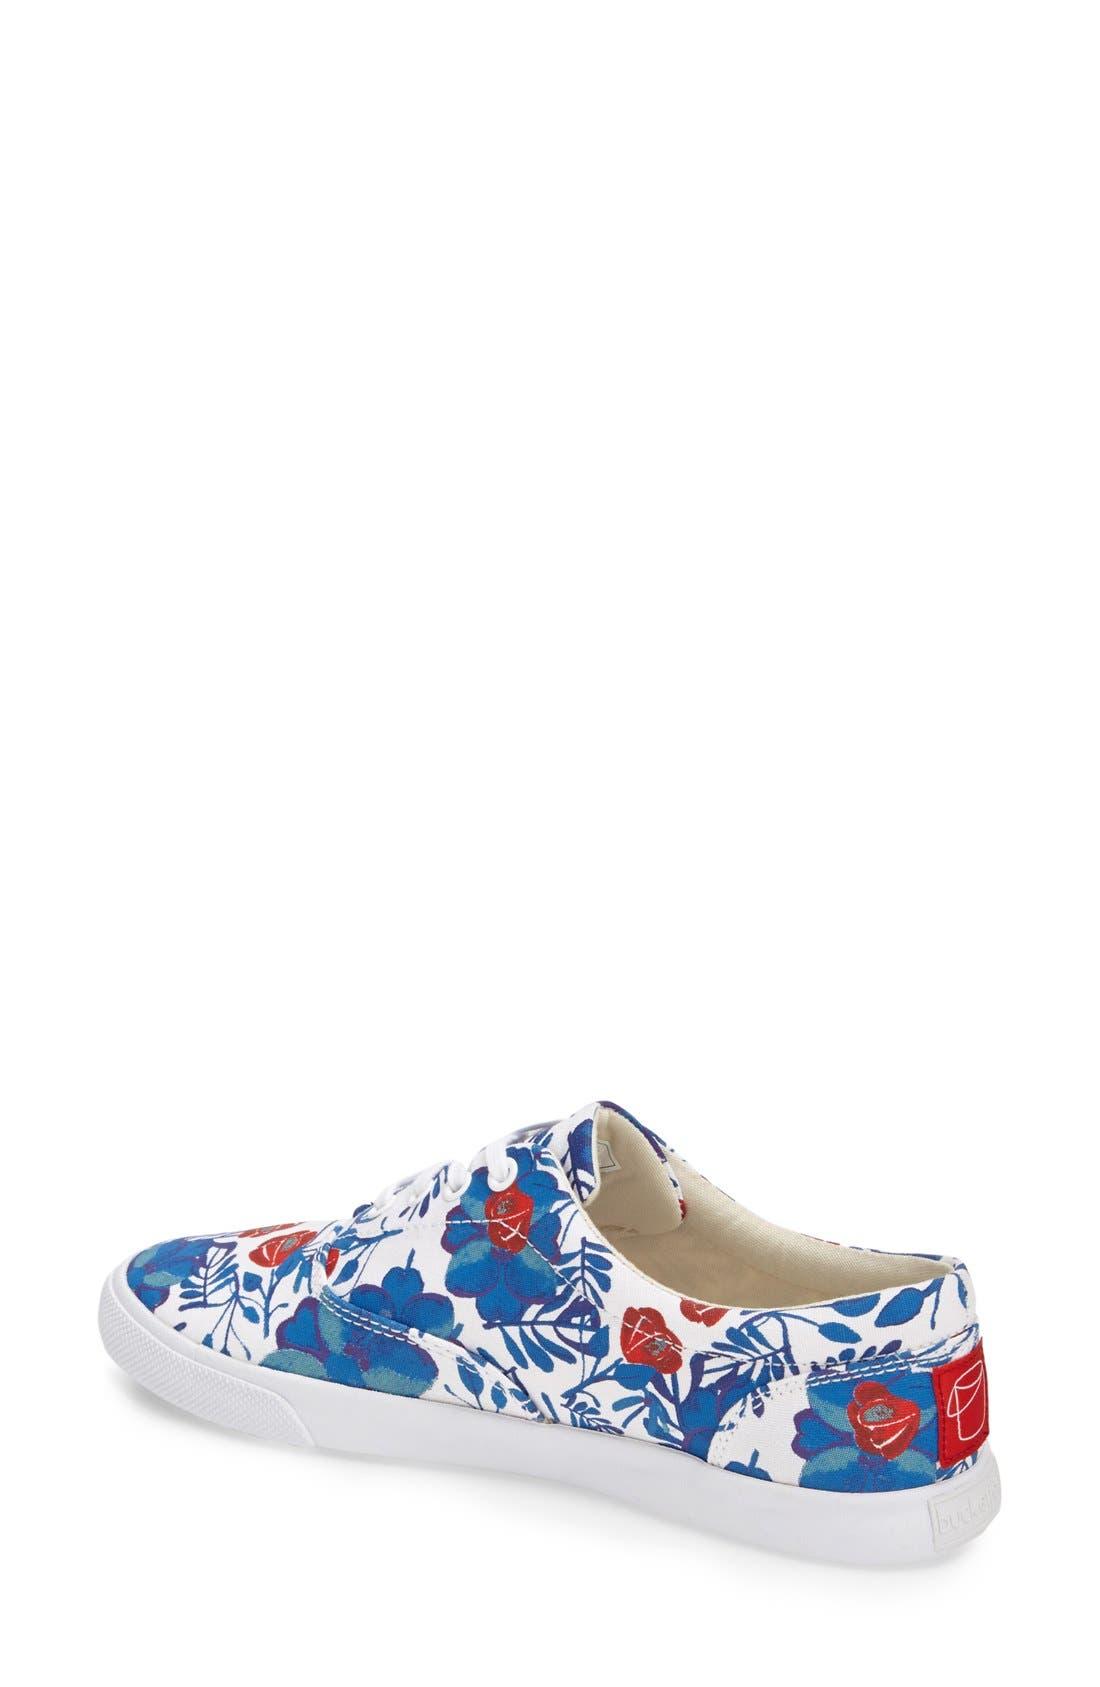 'Floral' Sneaker,                             Alternate thumbnail 3, color,                             400